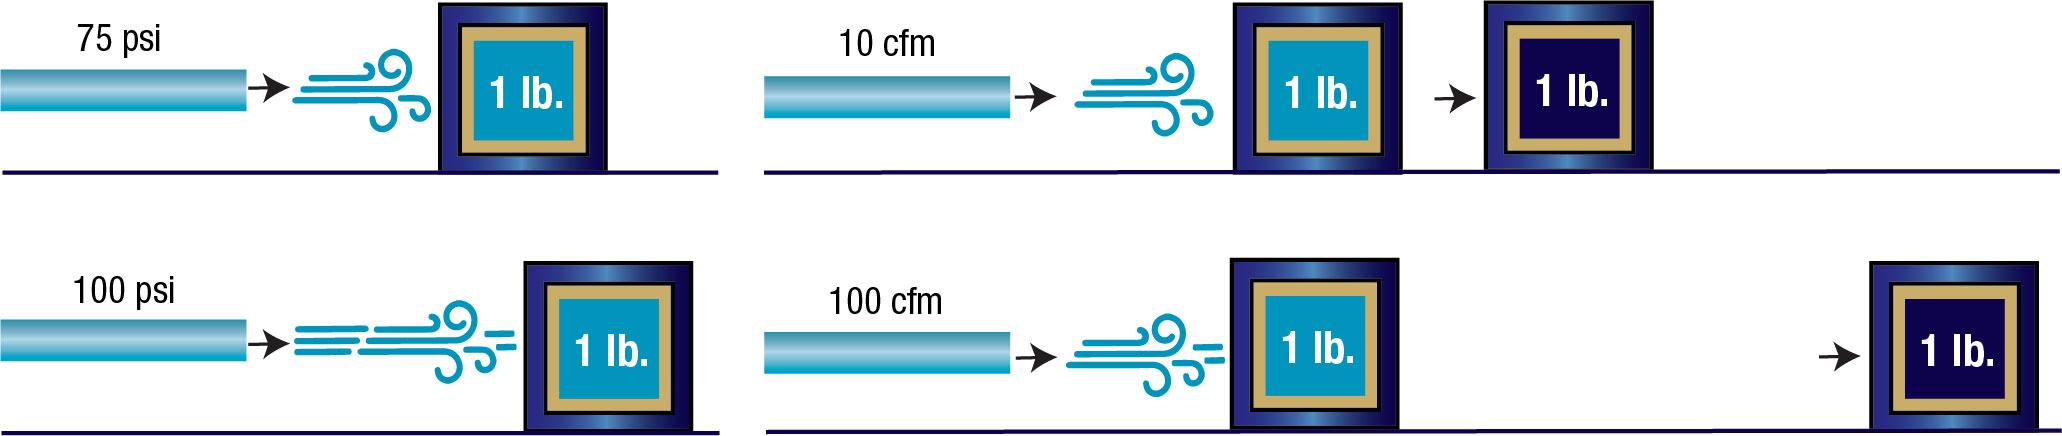 Understanding relationship between air pressure and flow | Cutting